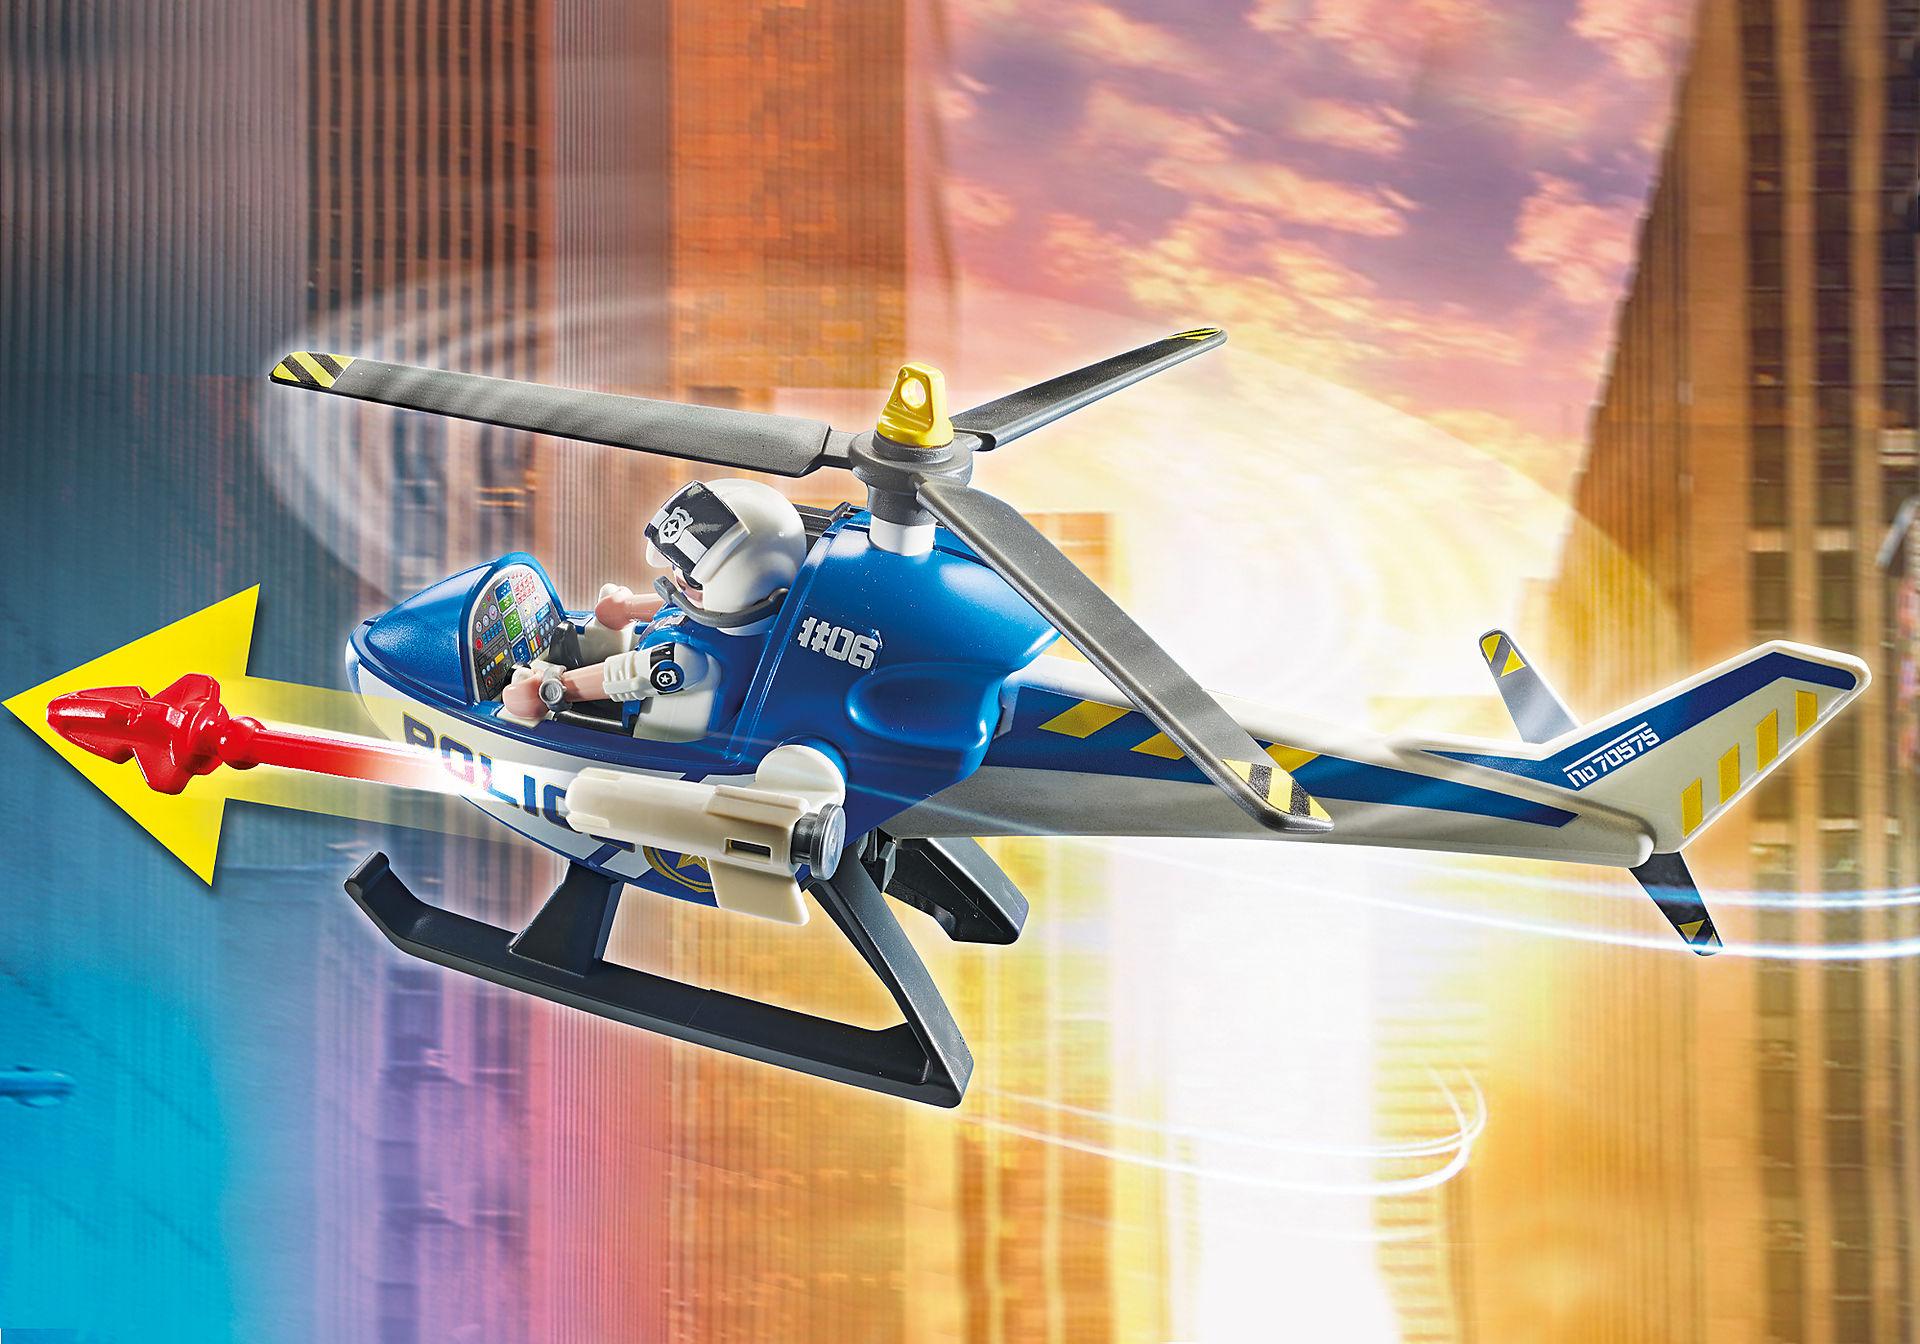 70575 Poliisihelikopteri: Pakoajoneuvon takaa-ajo zoom image4